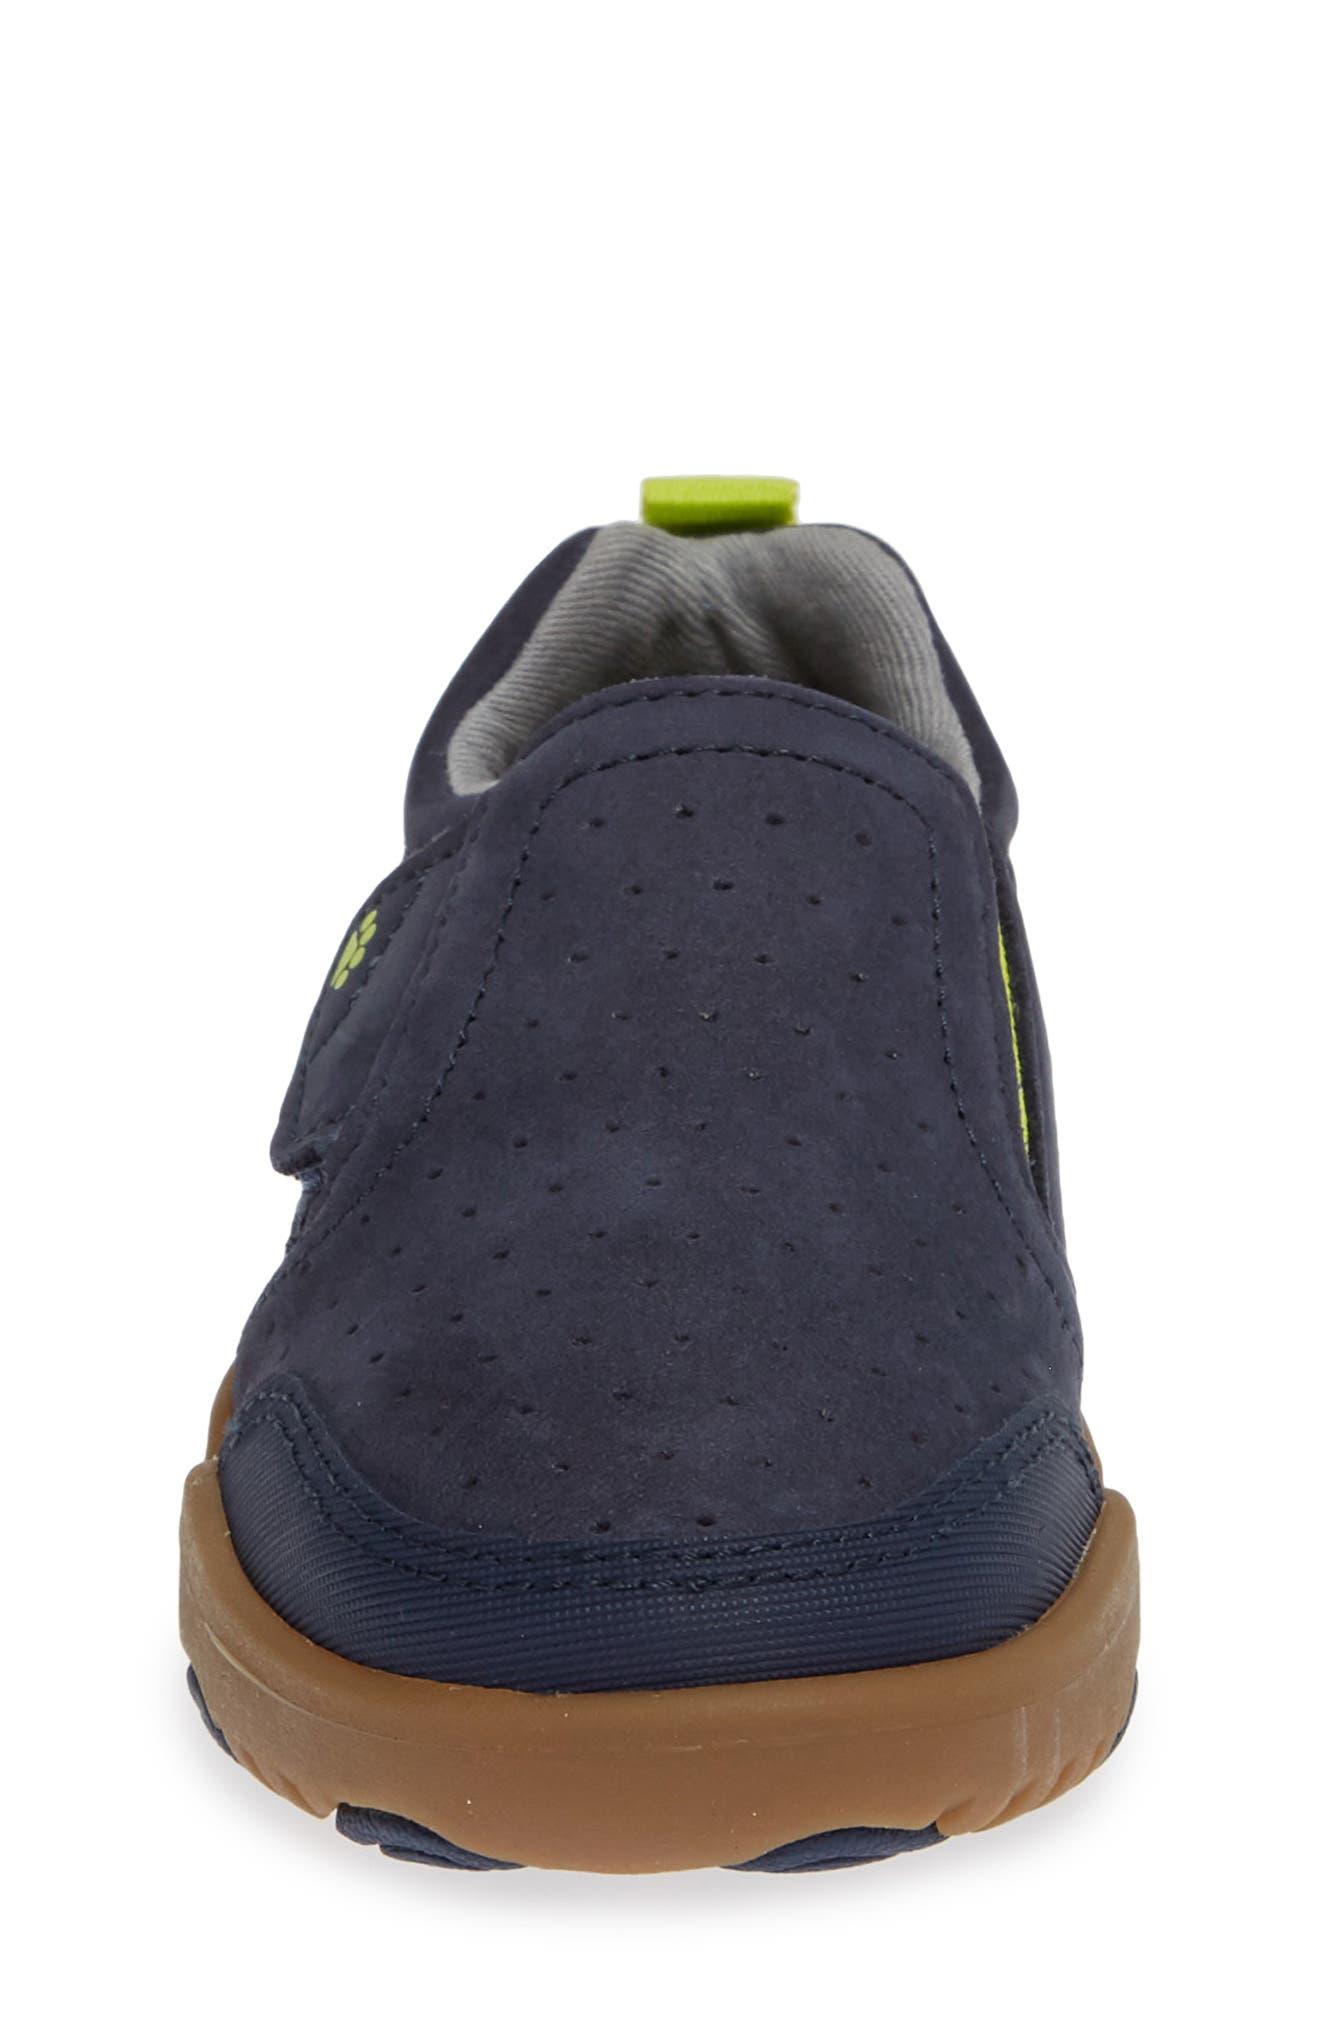 Marley Sneaker,                             Alternate thumbnail 4, color,                             NAVY